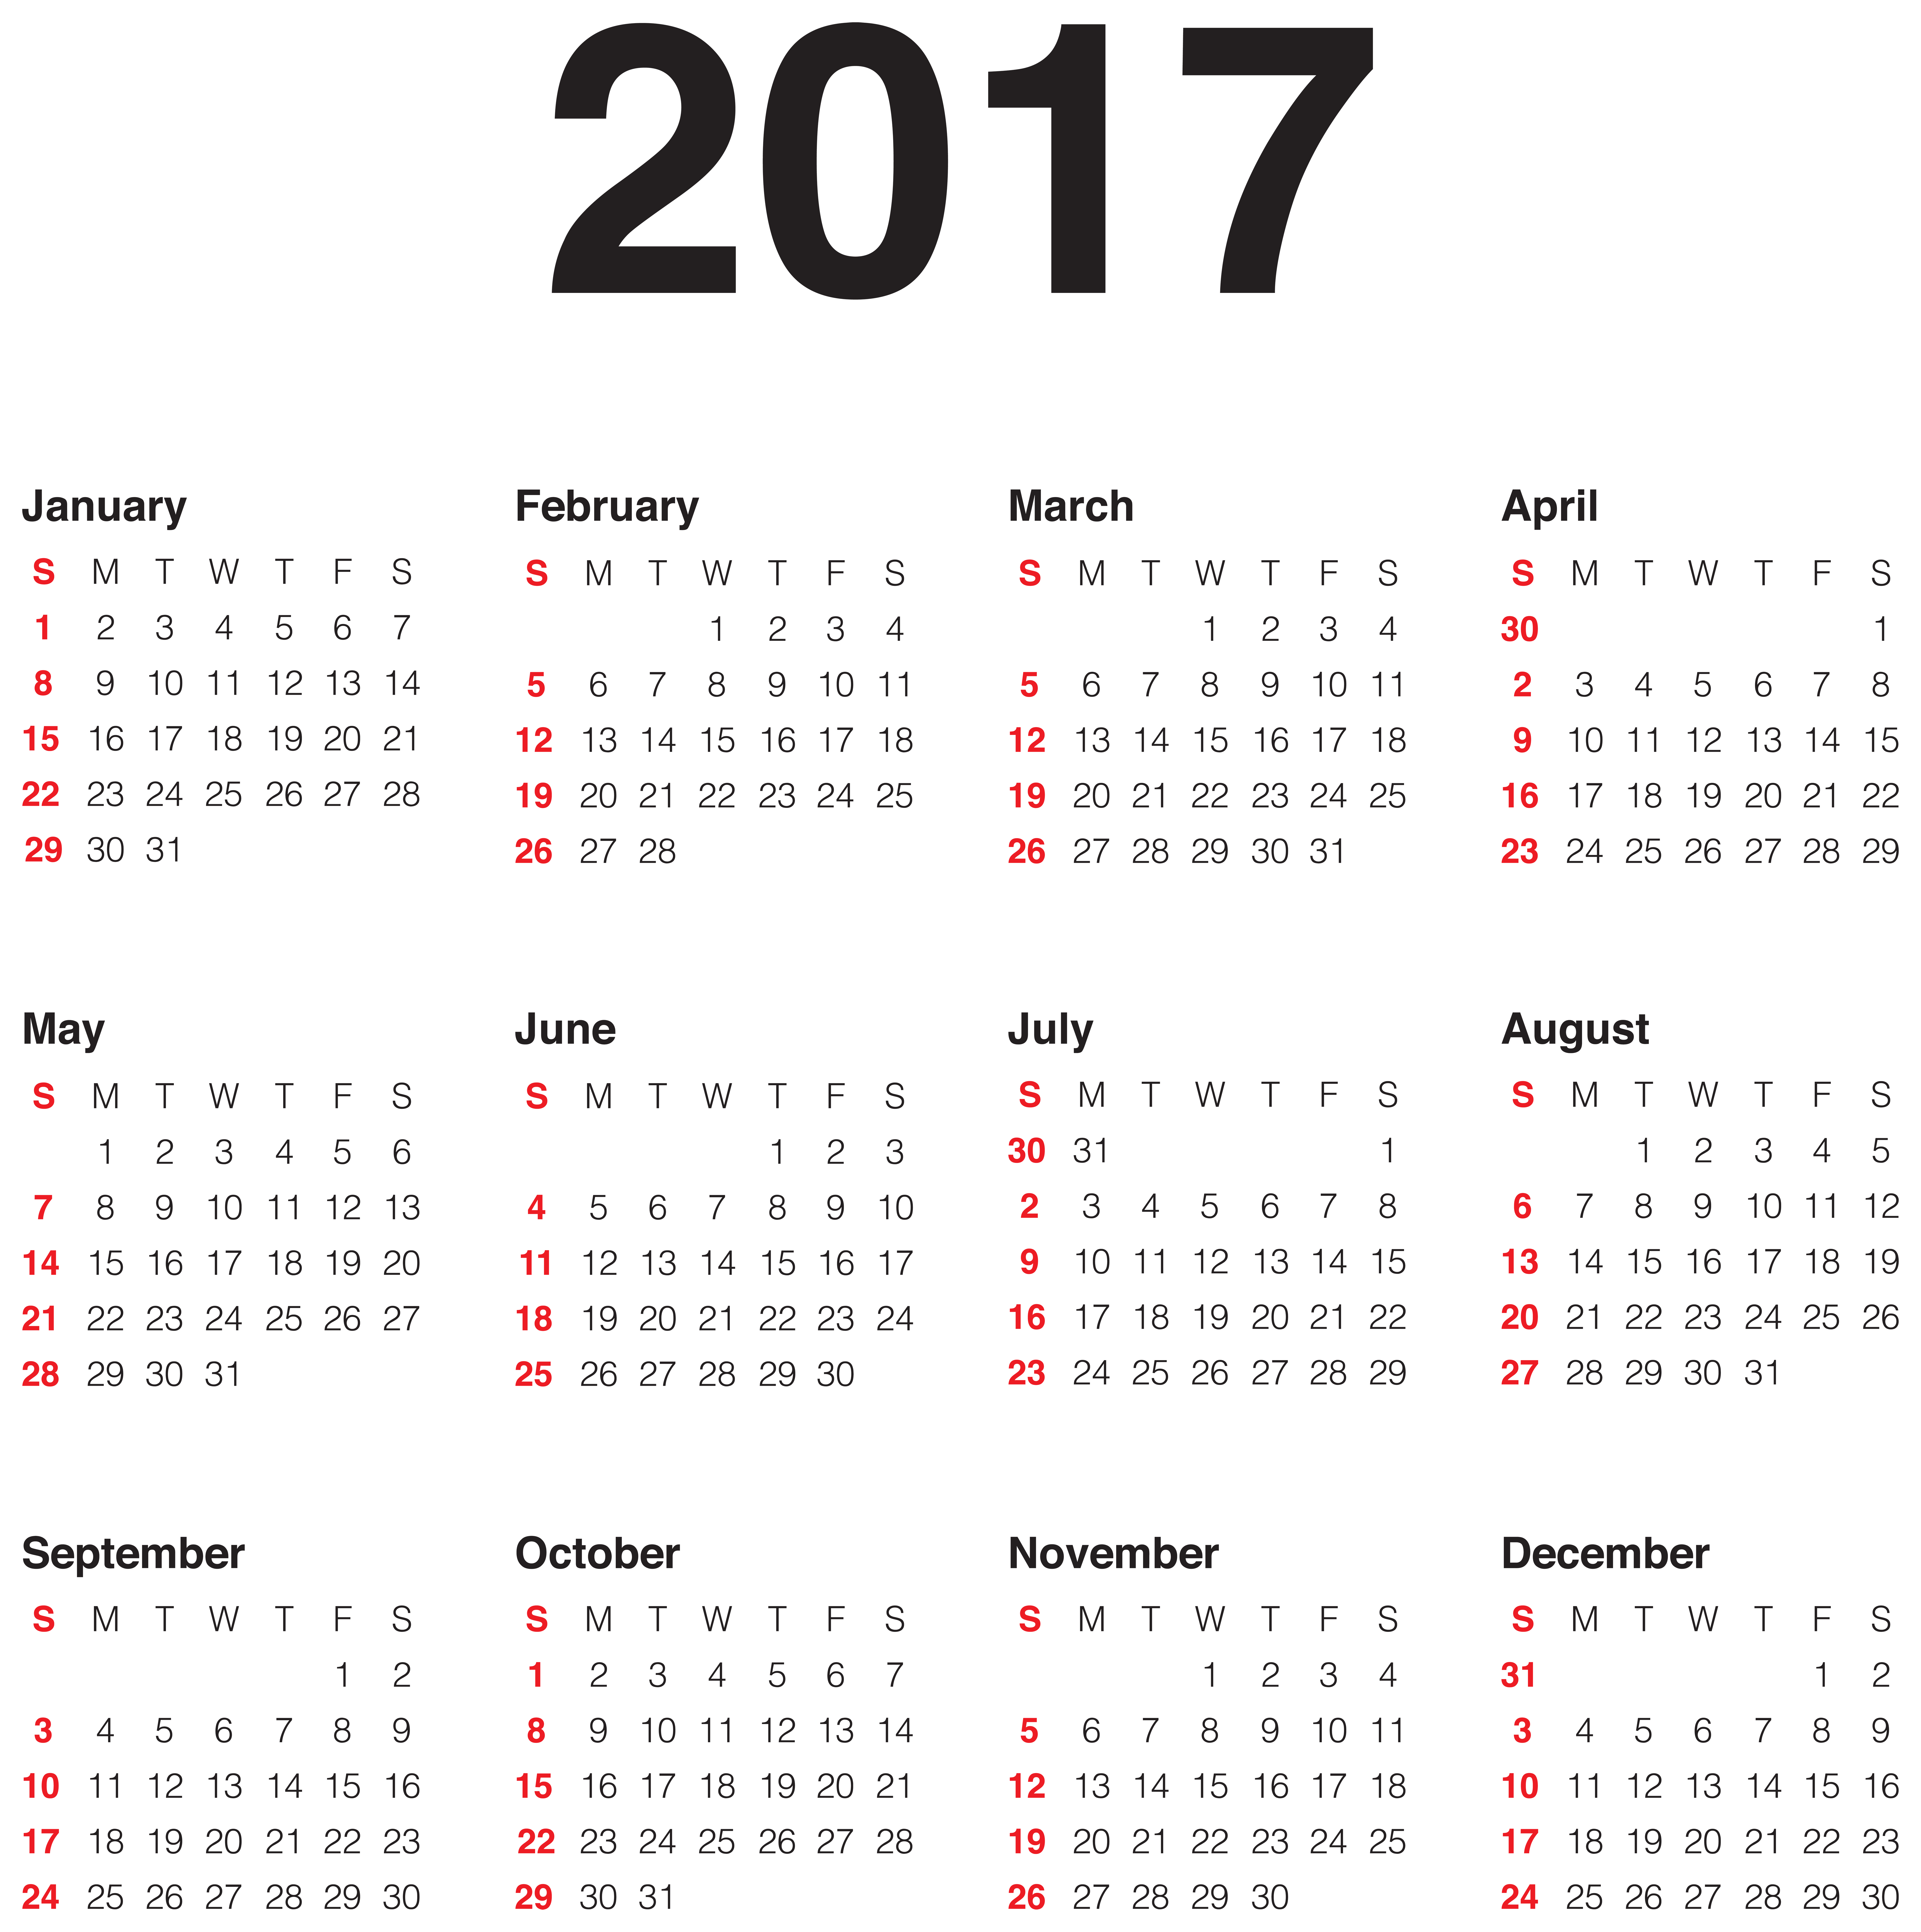 August calendar clipart ideas svg stock Best ideas about Calendar Png, Transparent Clip and Art Image on ... svg stock